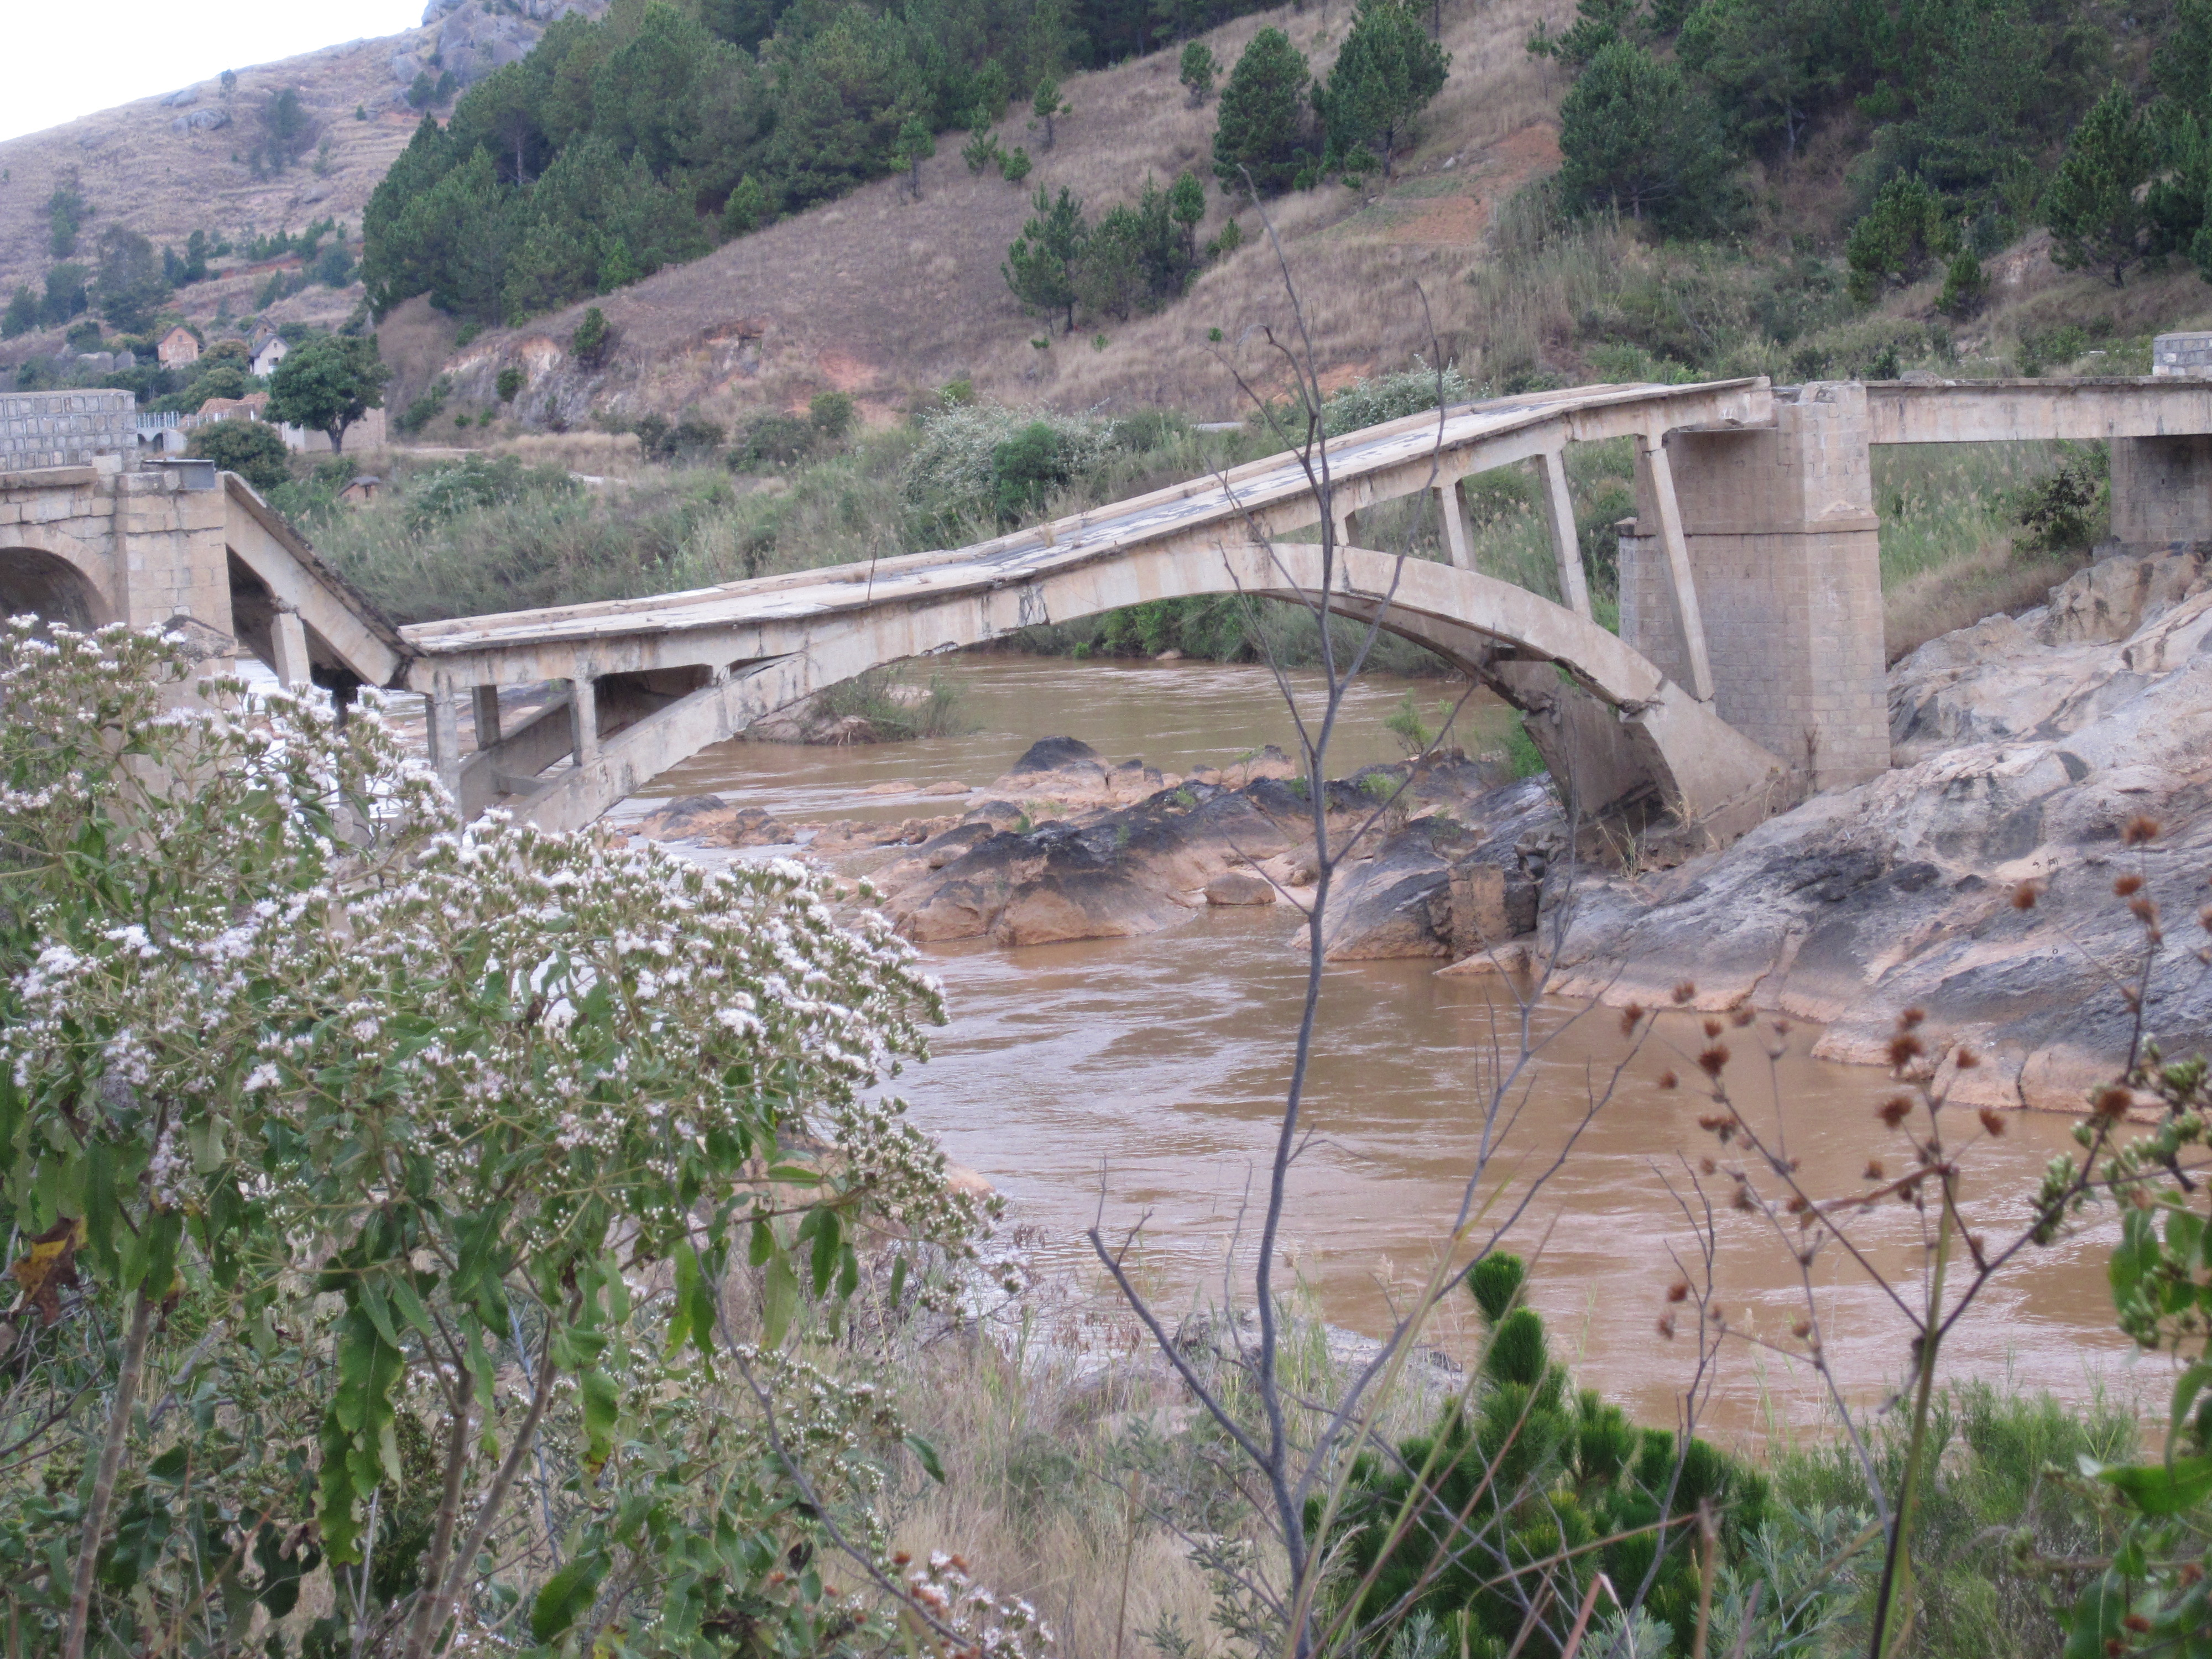 File:Broken bridge, Madagascar.jpg - Wikimedia Commons